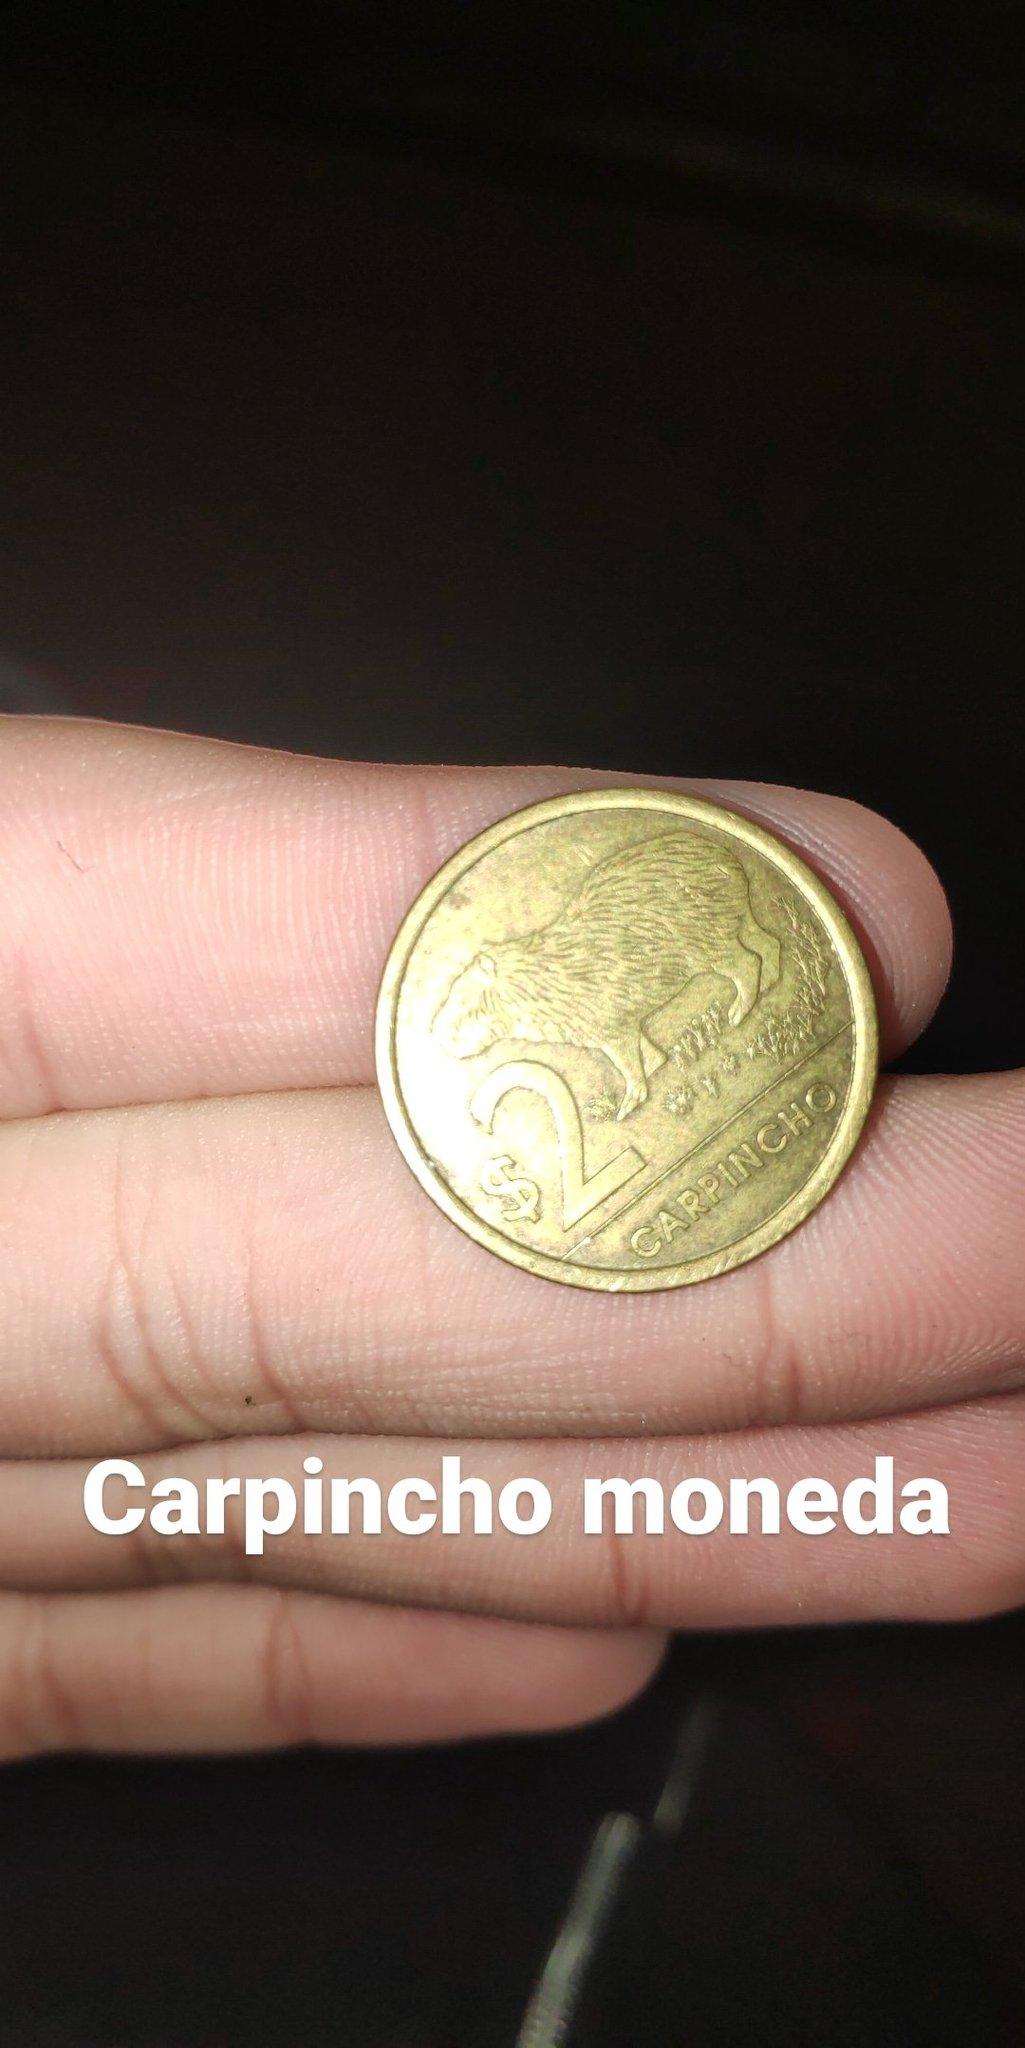 Carpincho moneda - meme